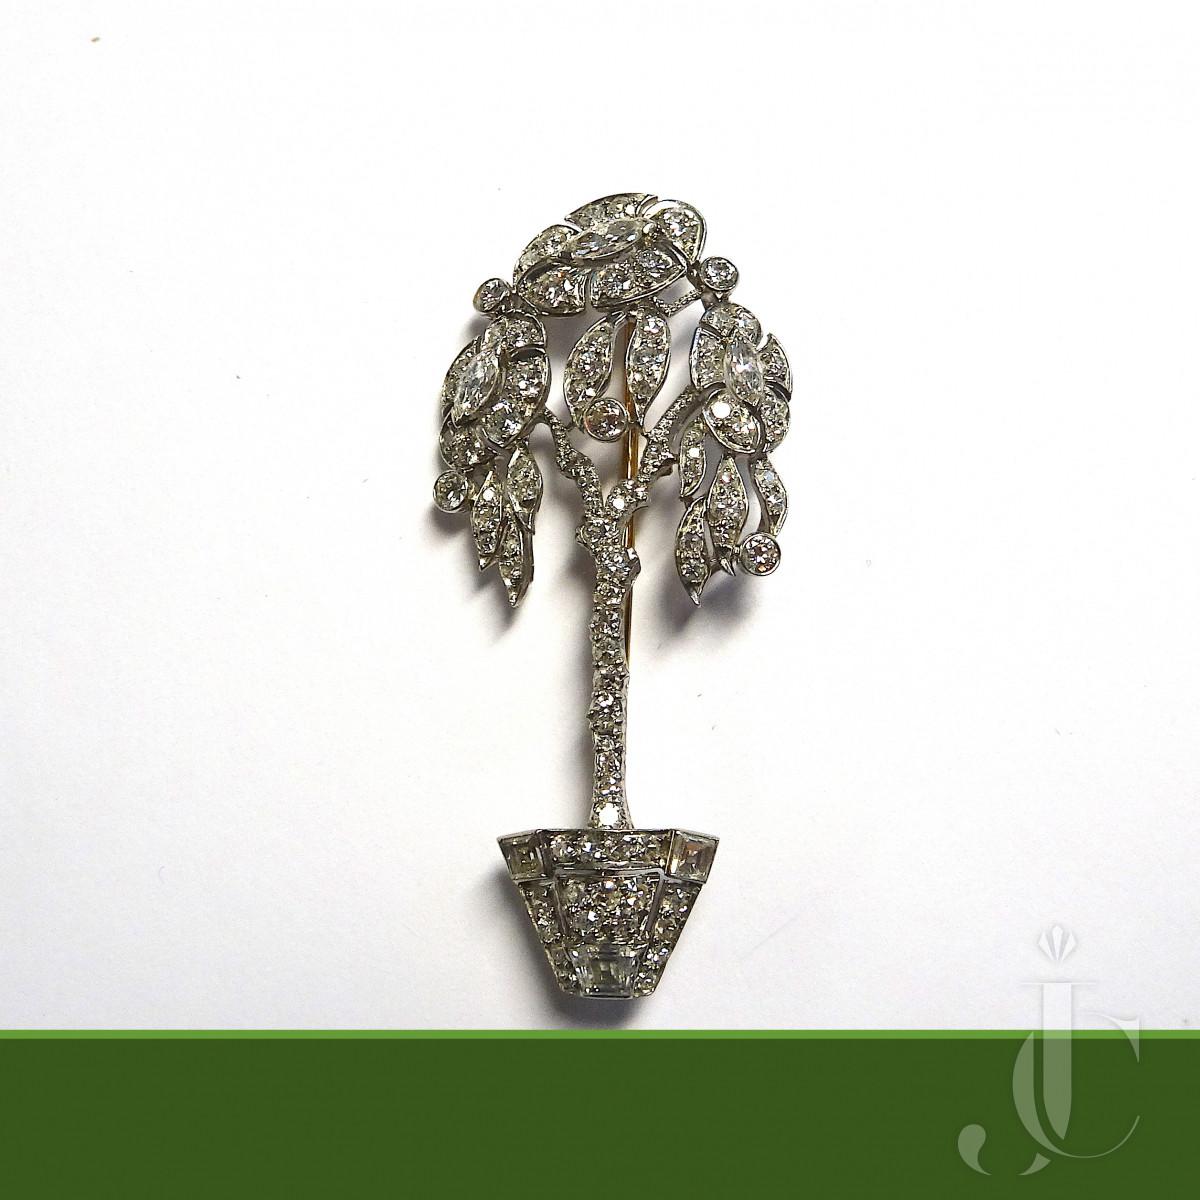 Diamond Tree Brooch